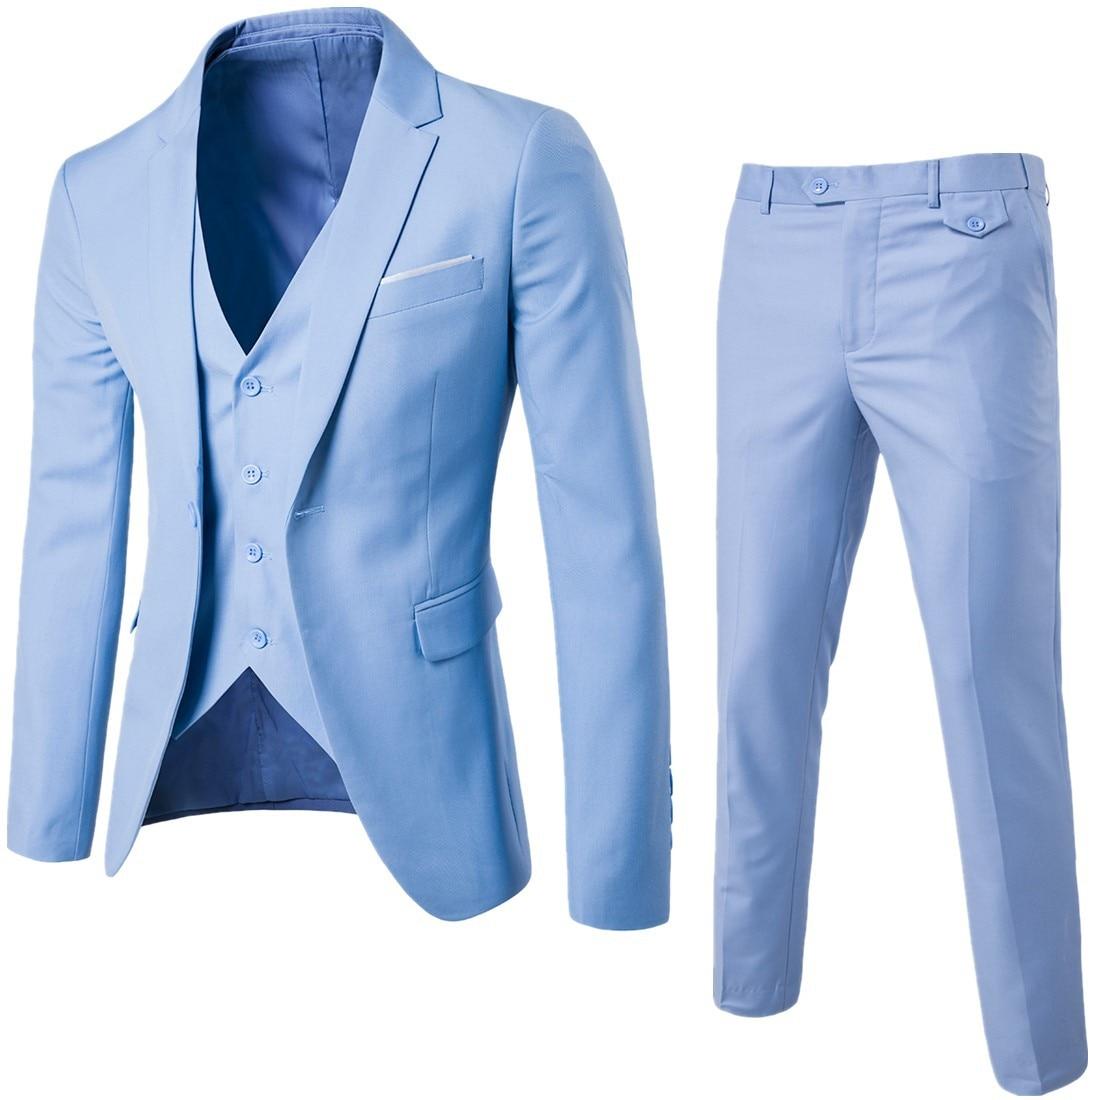 Autumn And Winter MEN'S Suit Set Dark Gray Wear Business Work Clothes Three-piece Set Best Man Groom Marriage Formal Dress